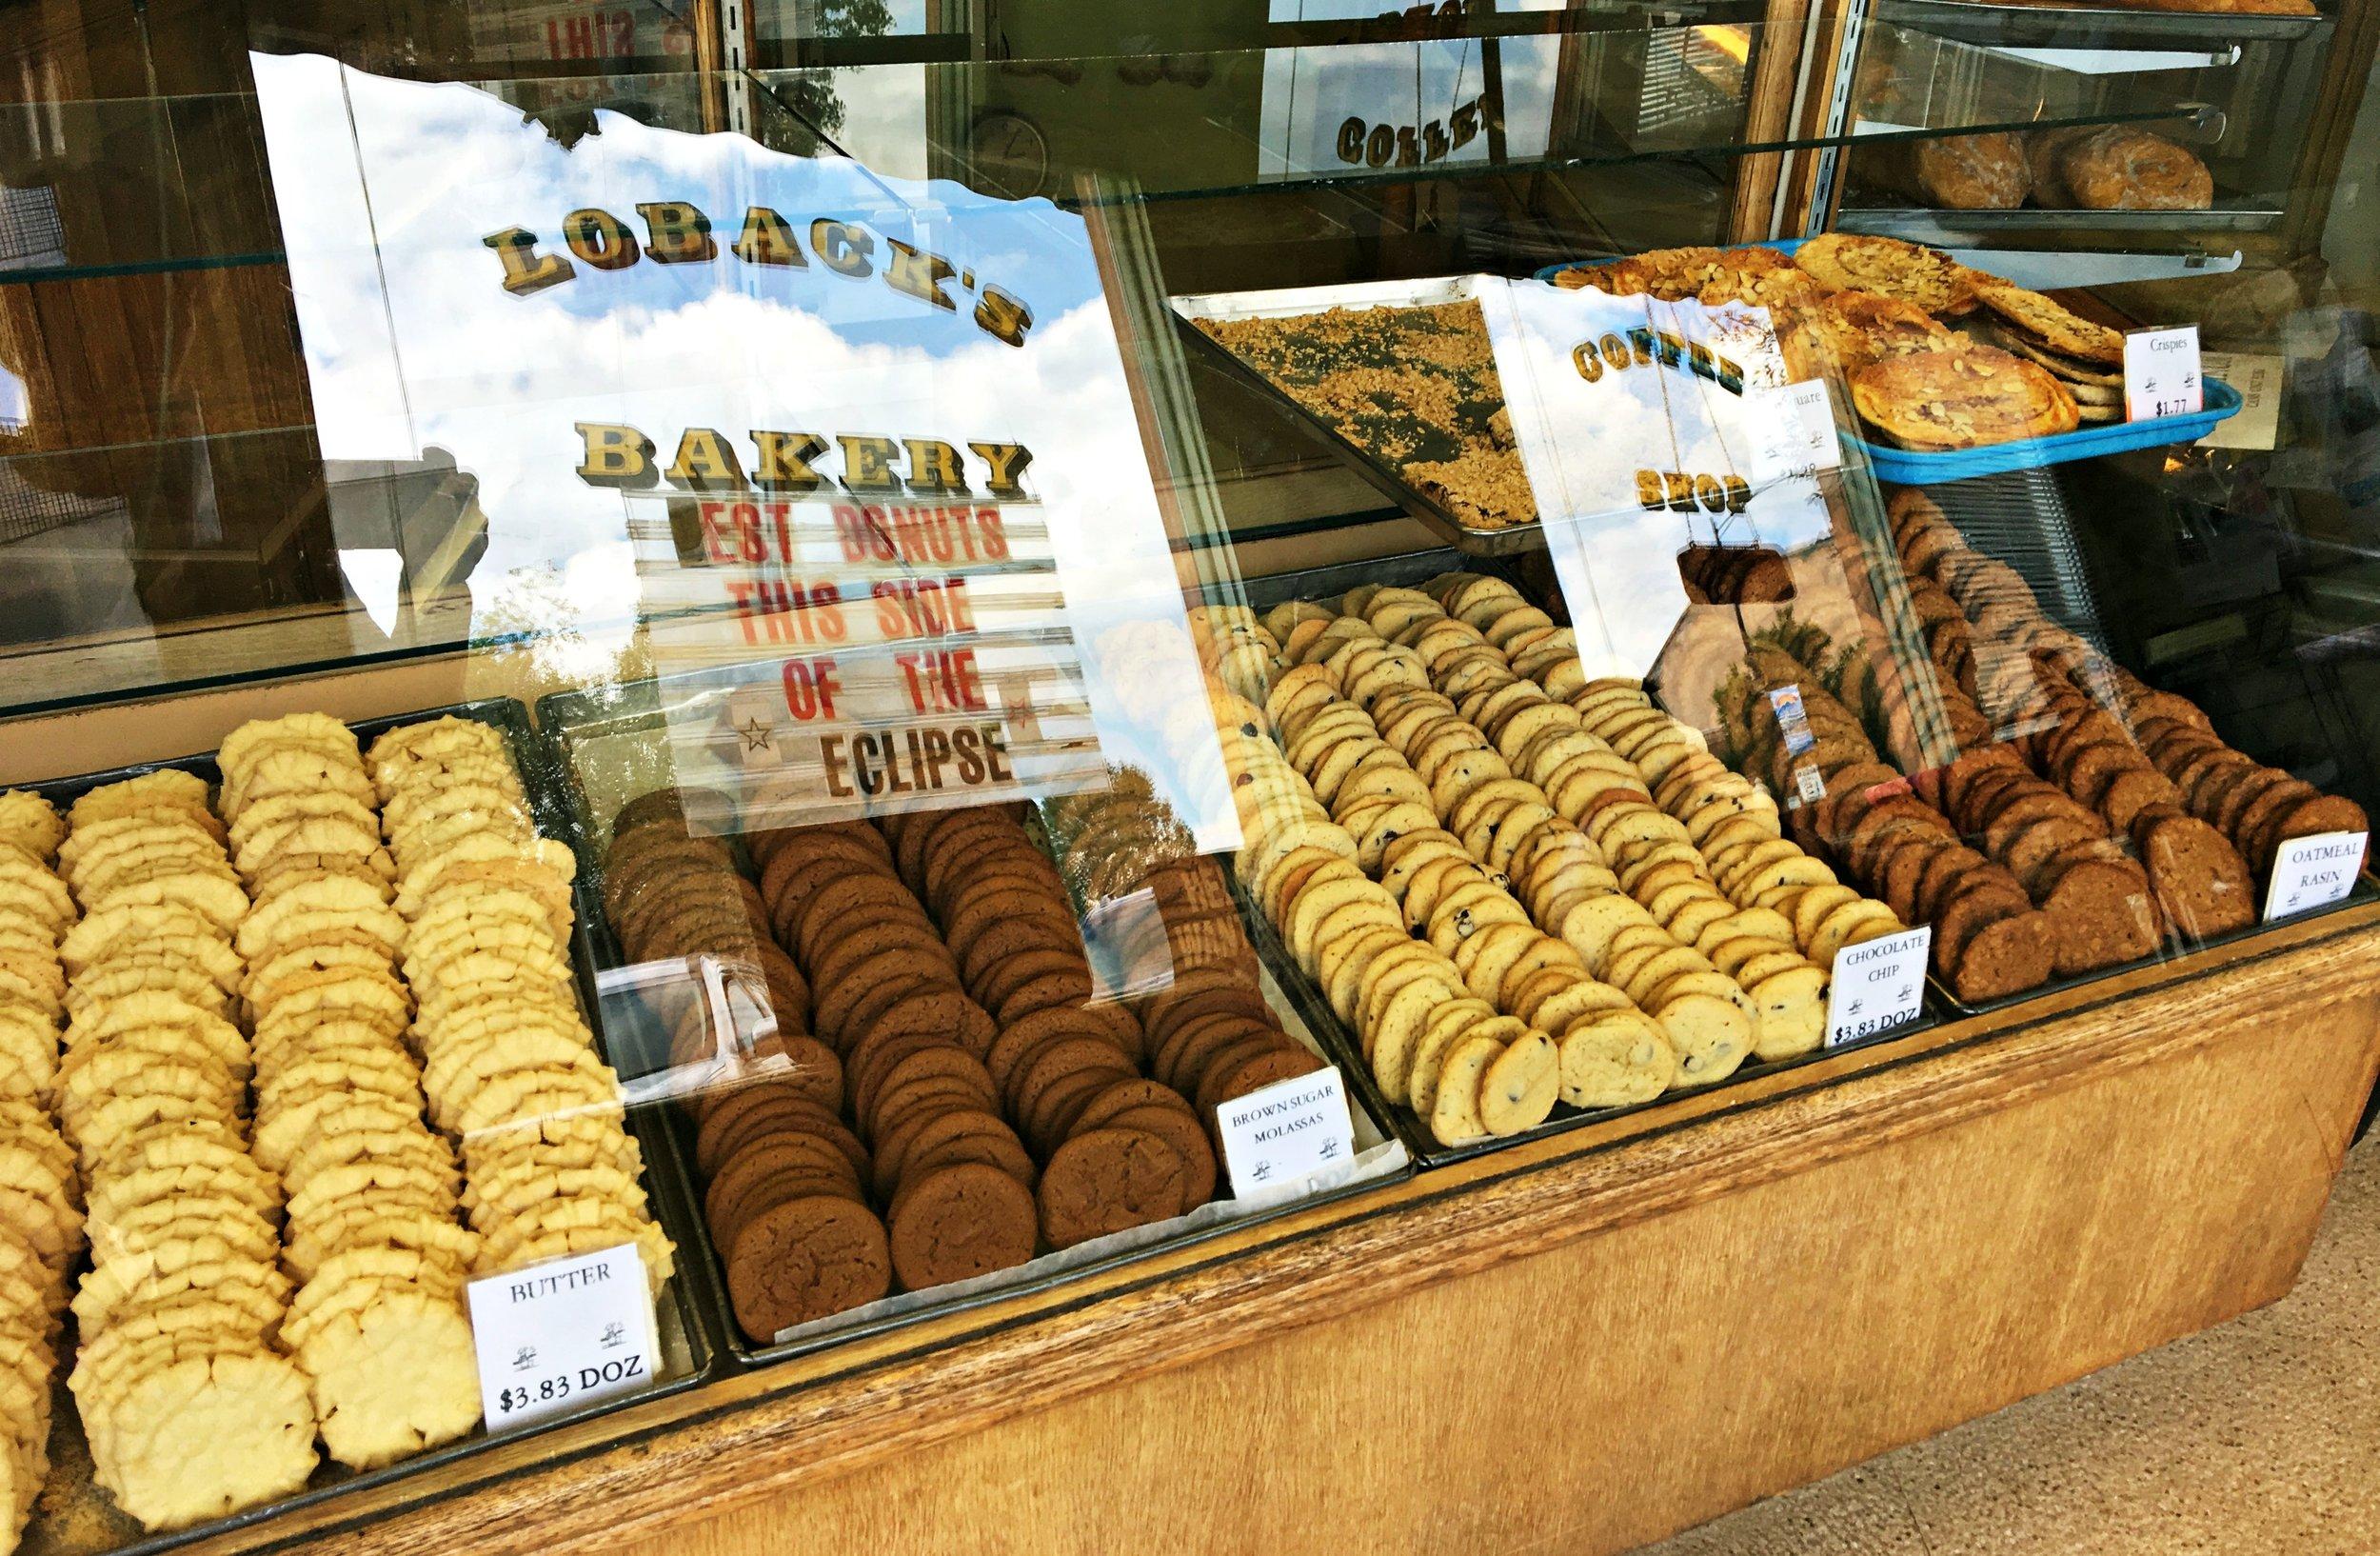 lobacks-bakery-main-street